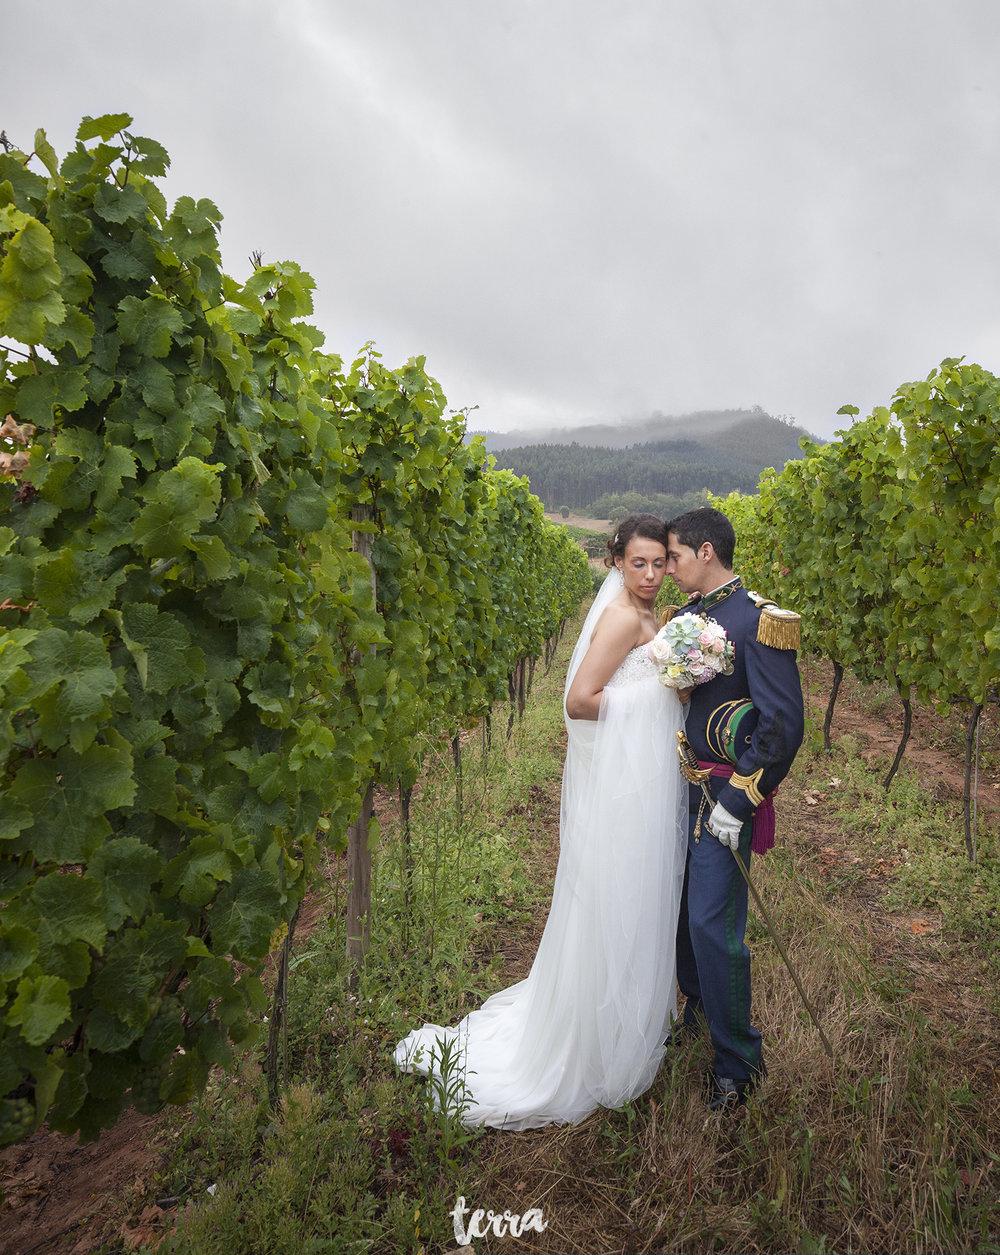 reportagem-fotografica-casamento-quinta-santana-mafra-terra-fotografia-0091.jpg